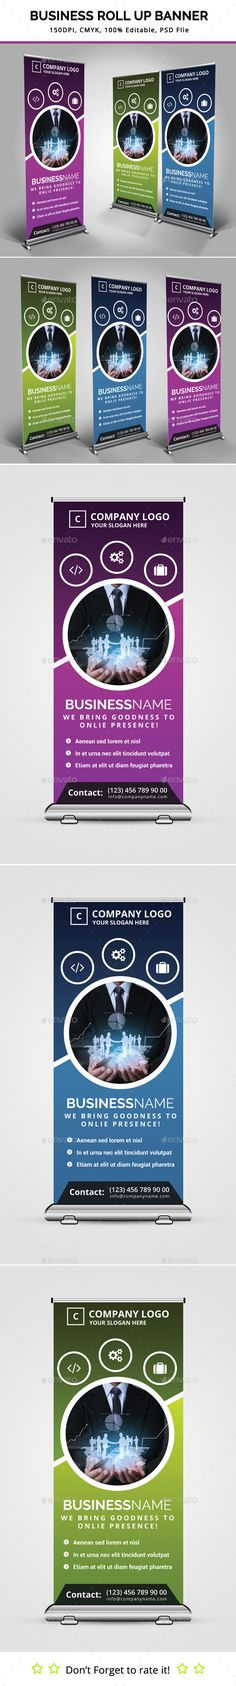 Business Roll Up Banner Template #design Download: http://graphicriver.net/item/business-roll-up-banner-v10/11531891?ref=ksioks